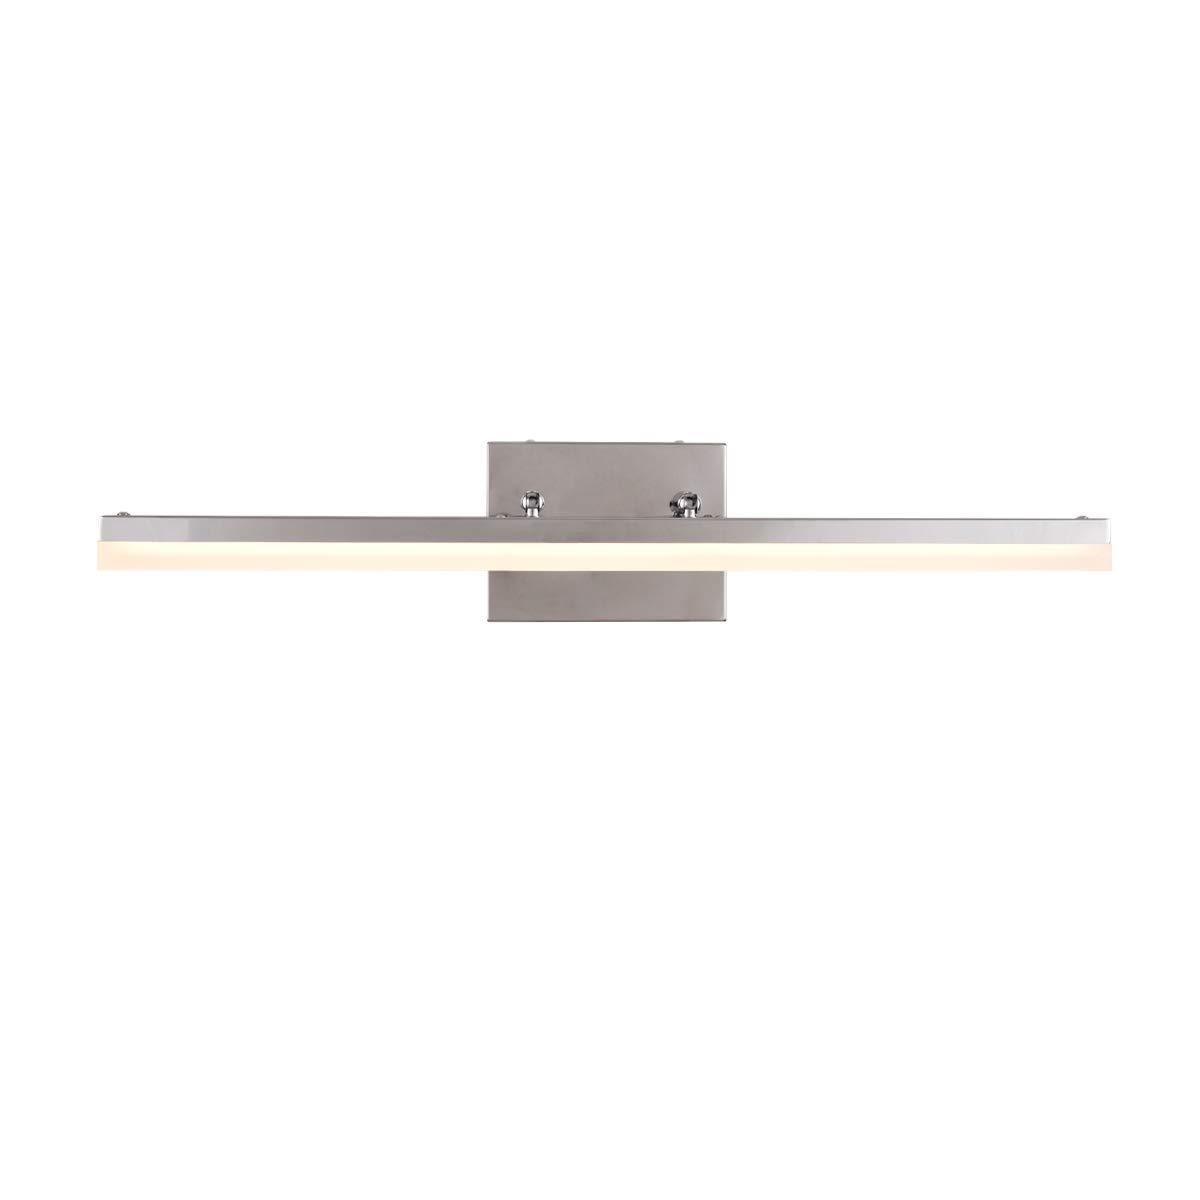 mirrea 24in Modern LED Vanity Light for Bathroom Lighting Dimmable 24w Warm White